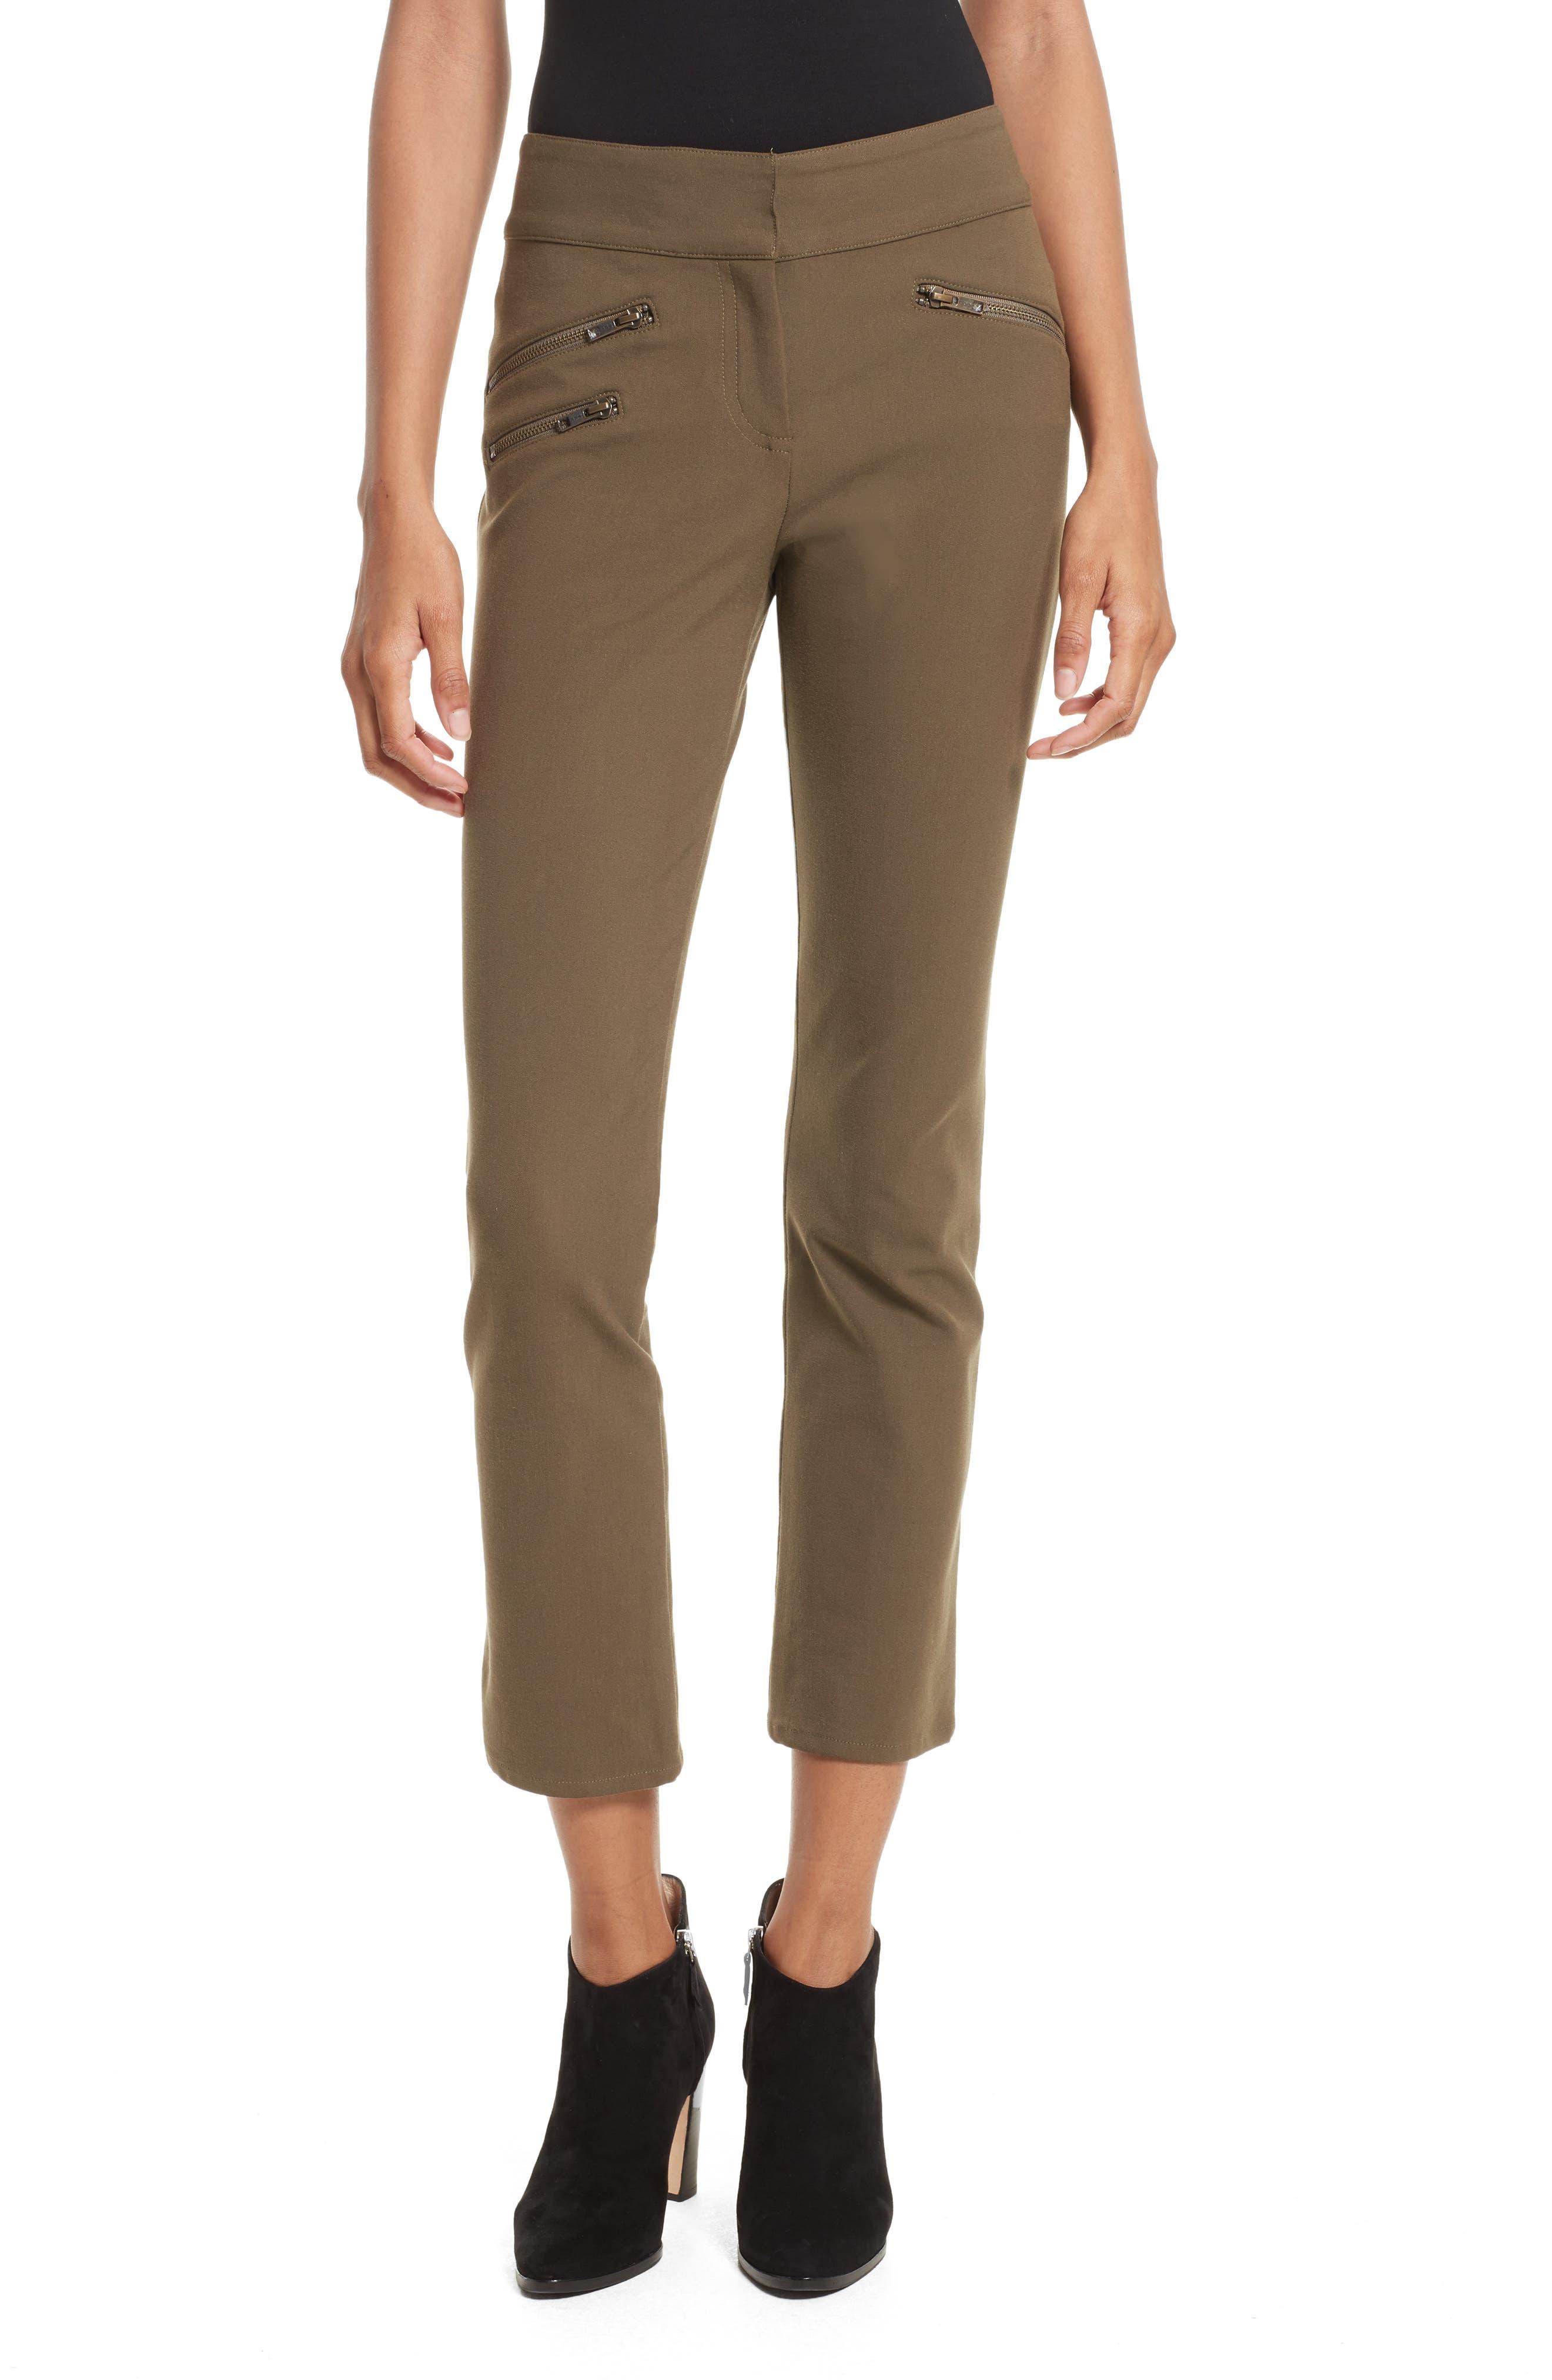 Veronica Beard Adelaide Zipper Detail Crop Pants